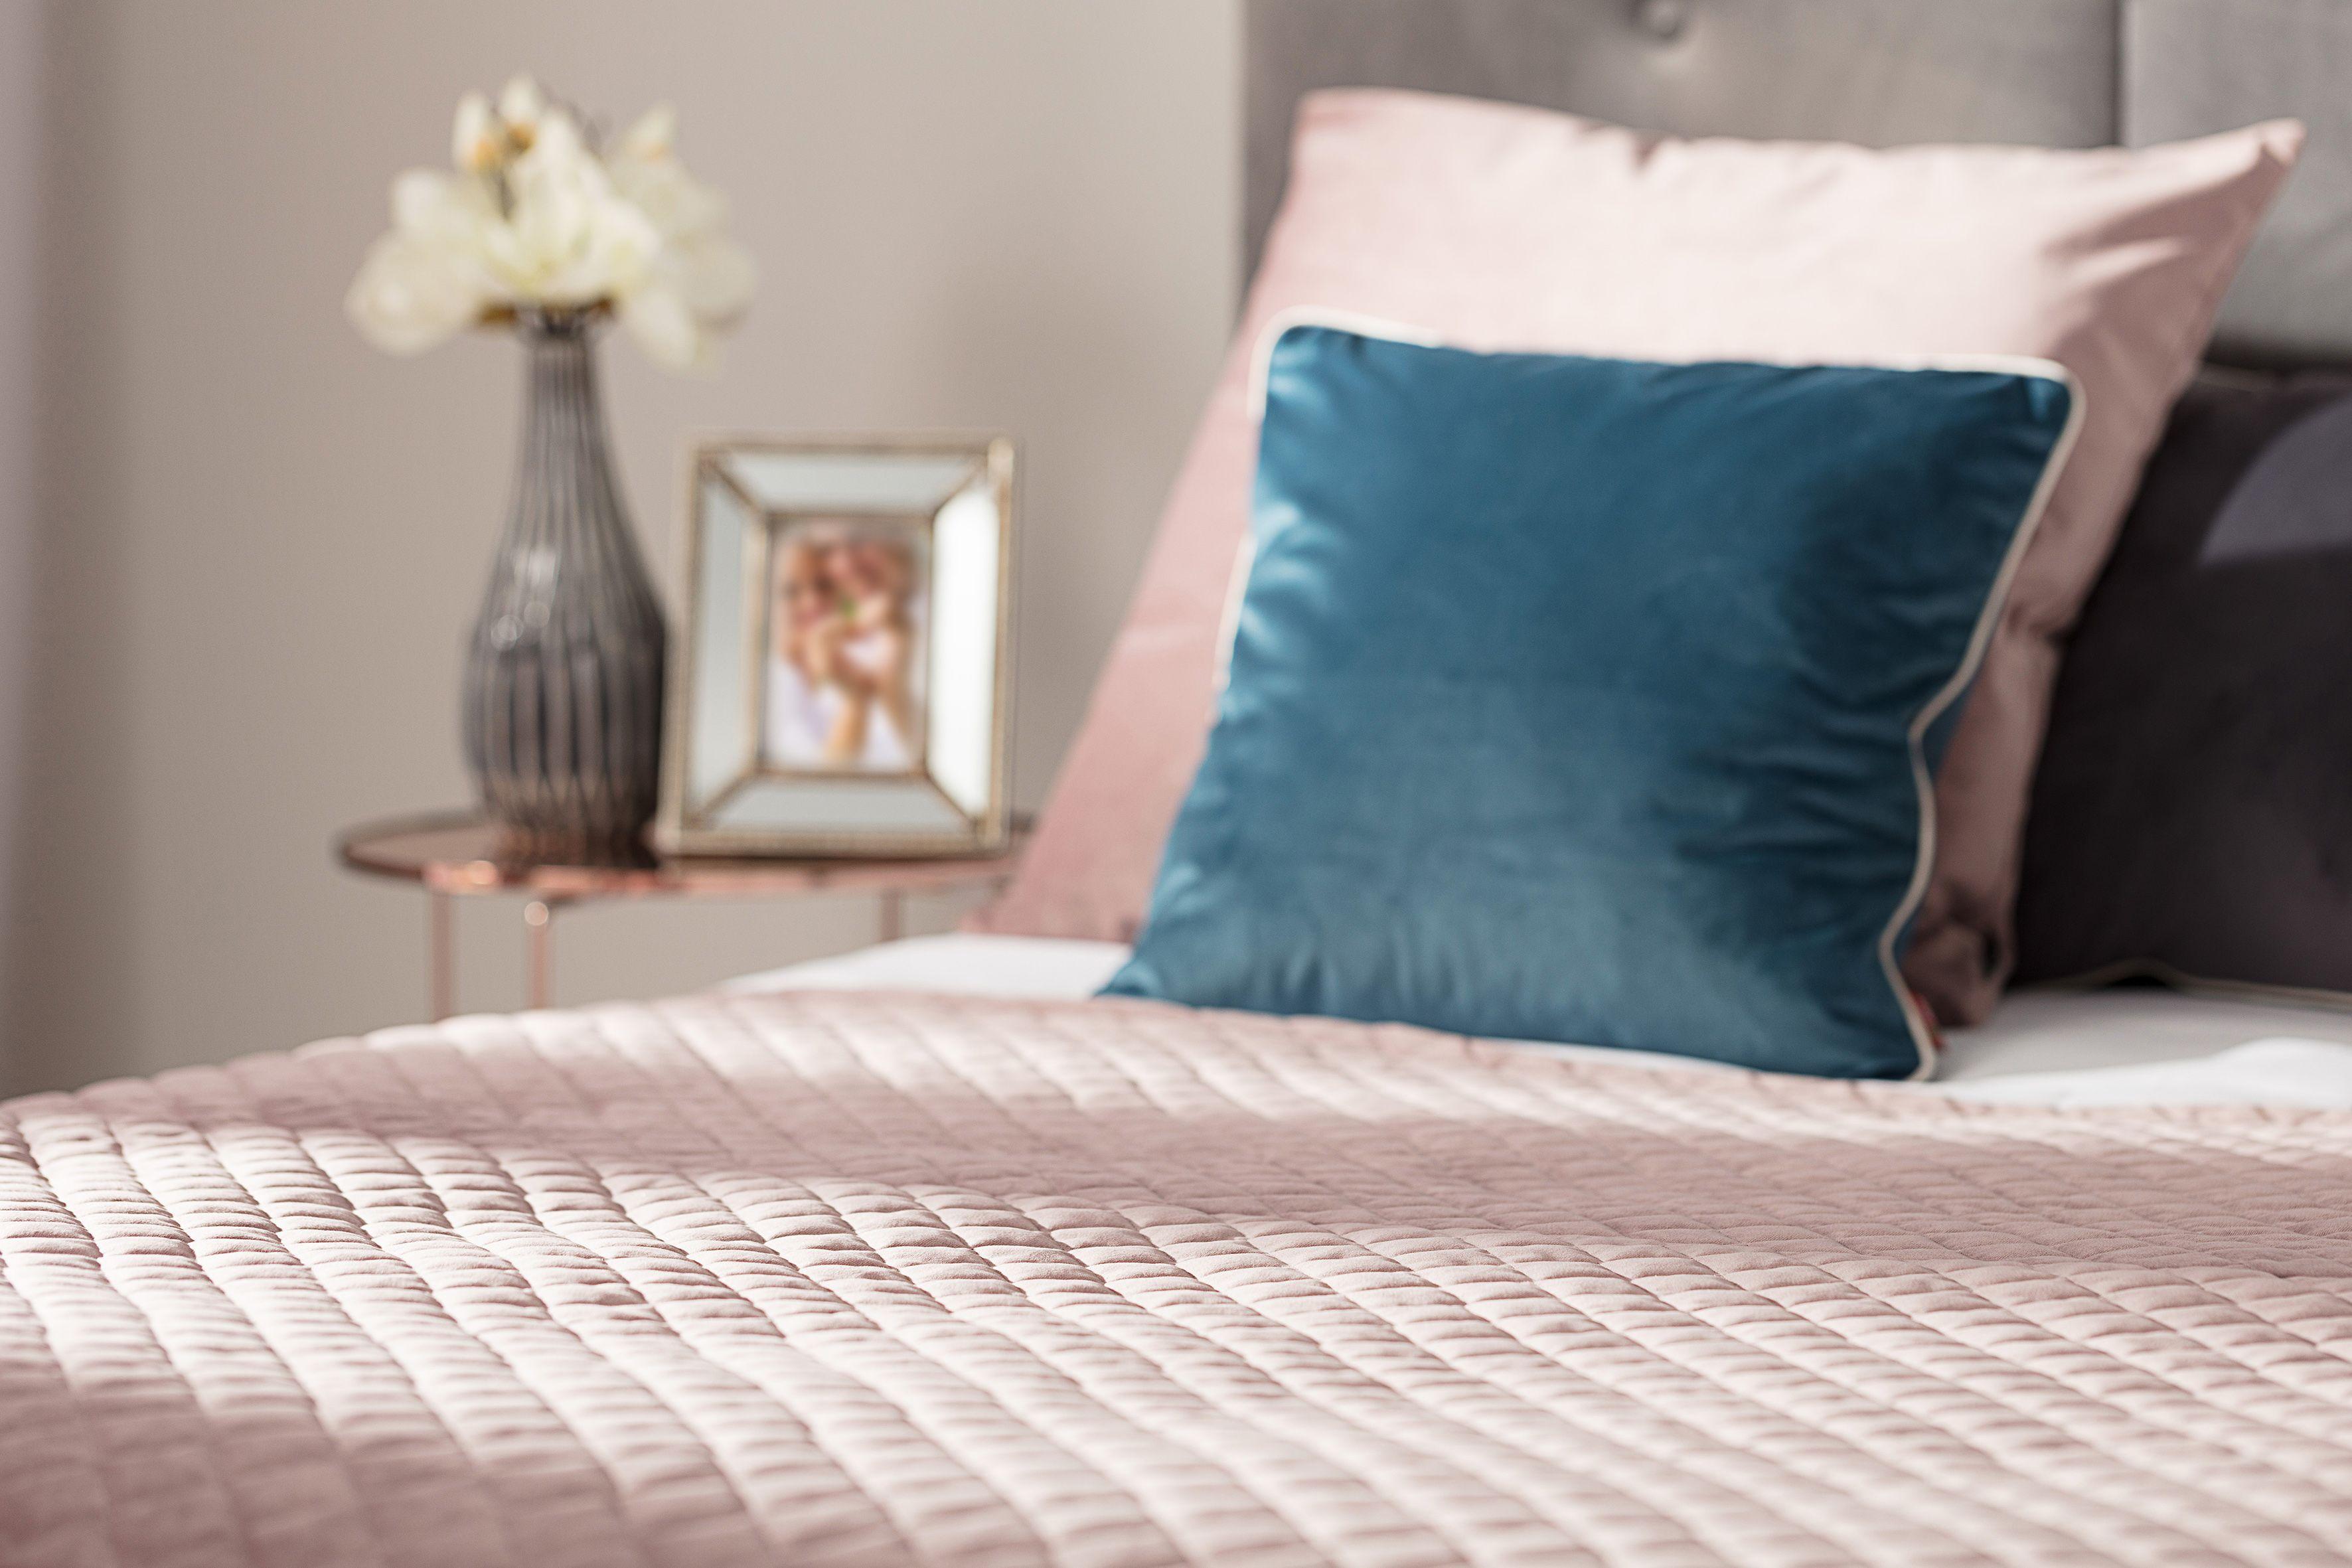 Bedding Velvet #Dekoriapl #Pink #Luxury #Bedding #Blue #Pillows #Bedroom